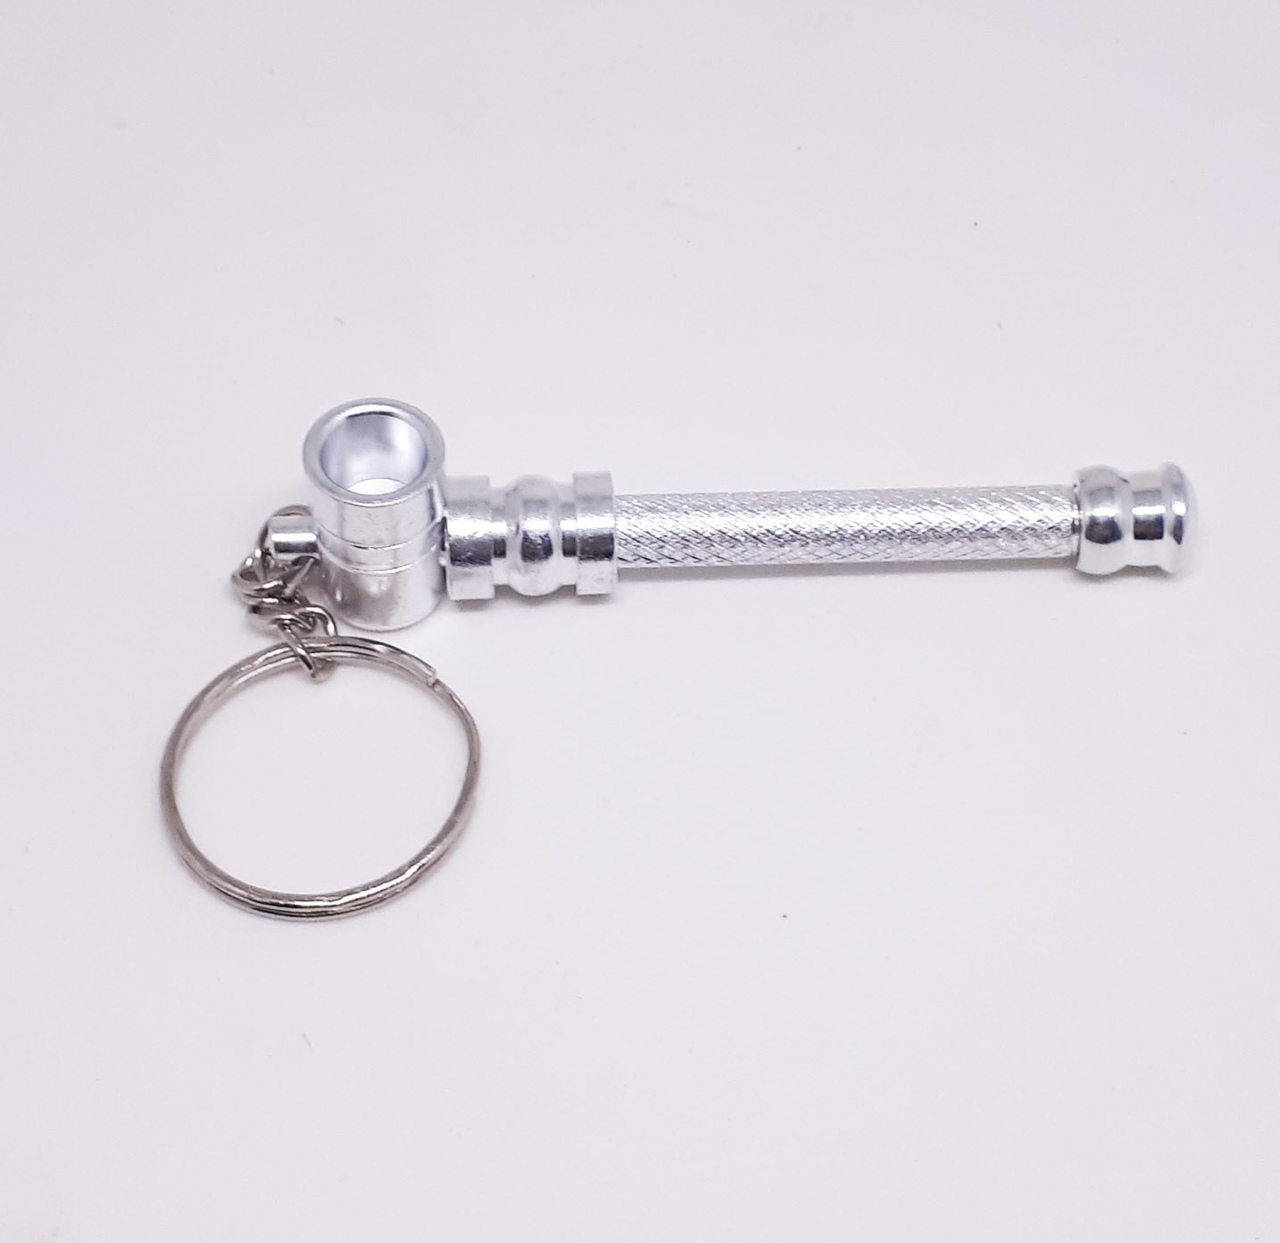 Cachimbo de Metal Keychan Pequeno